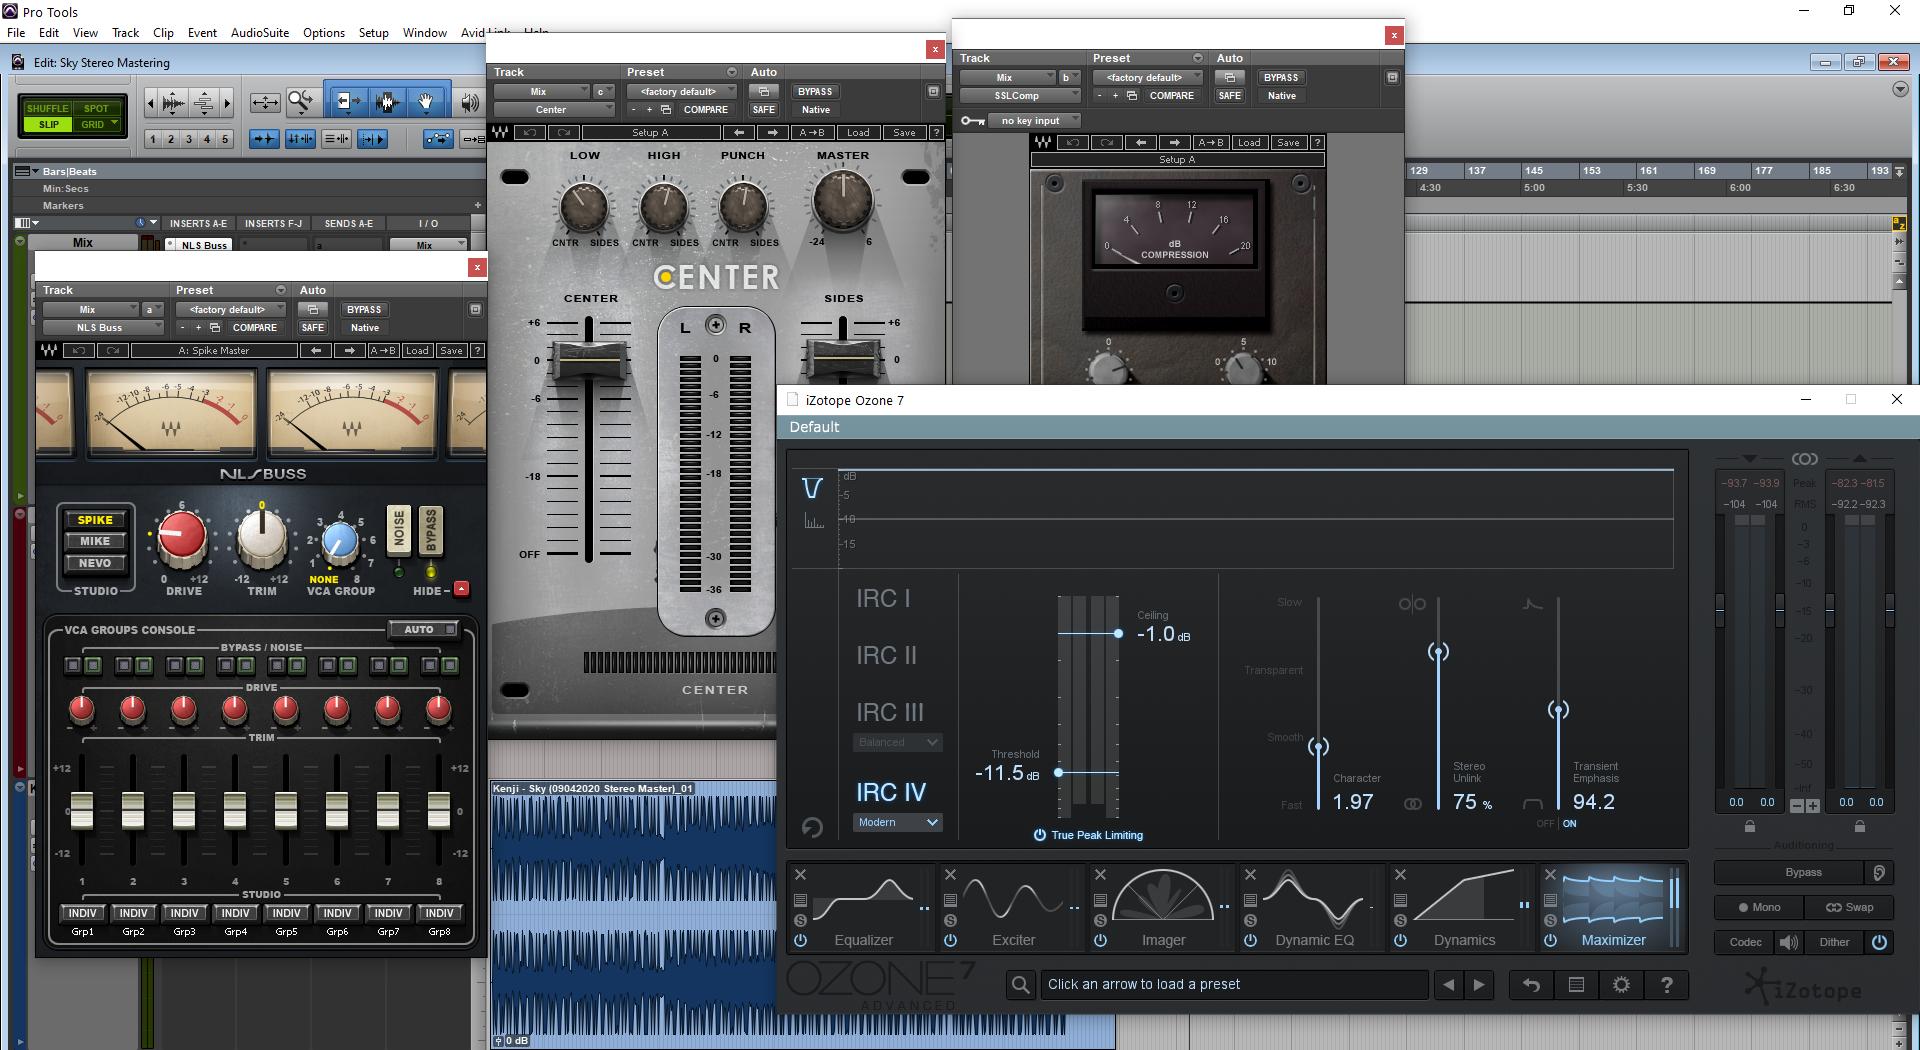 Cardiopalmo Stereo Mastering